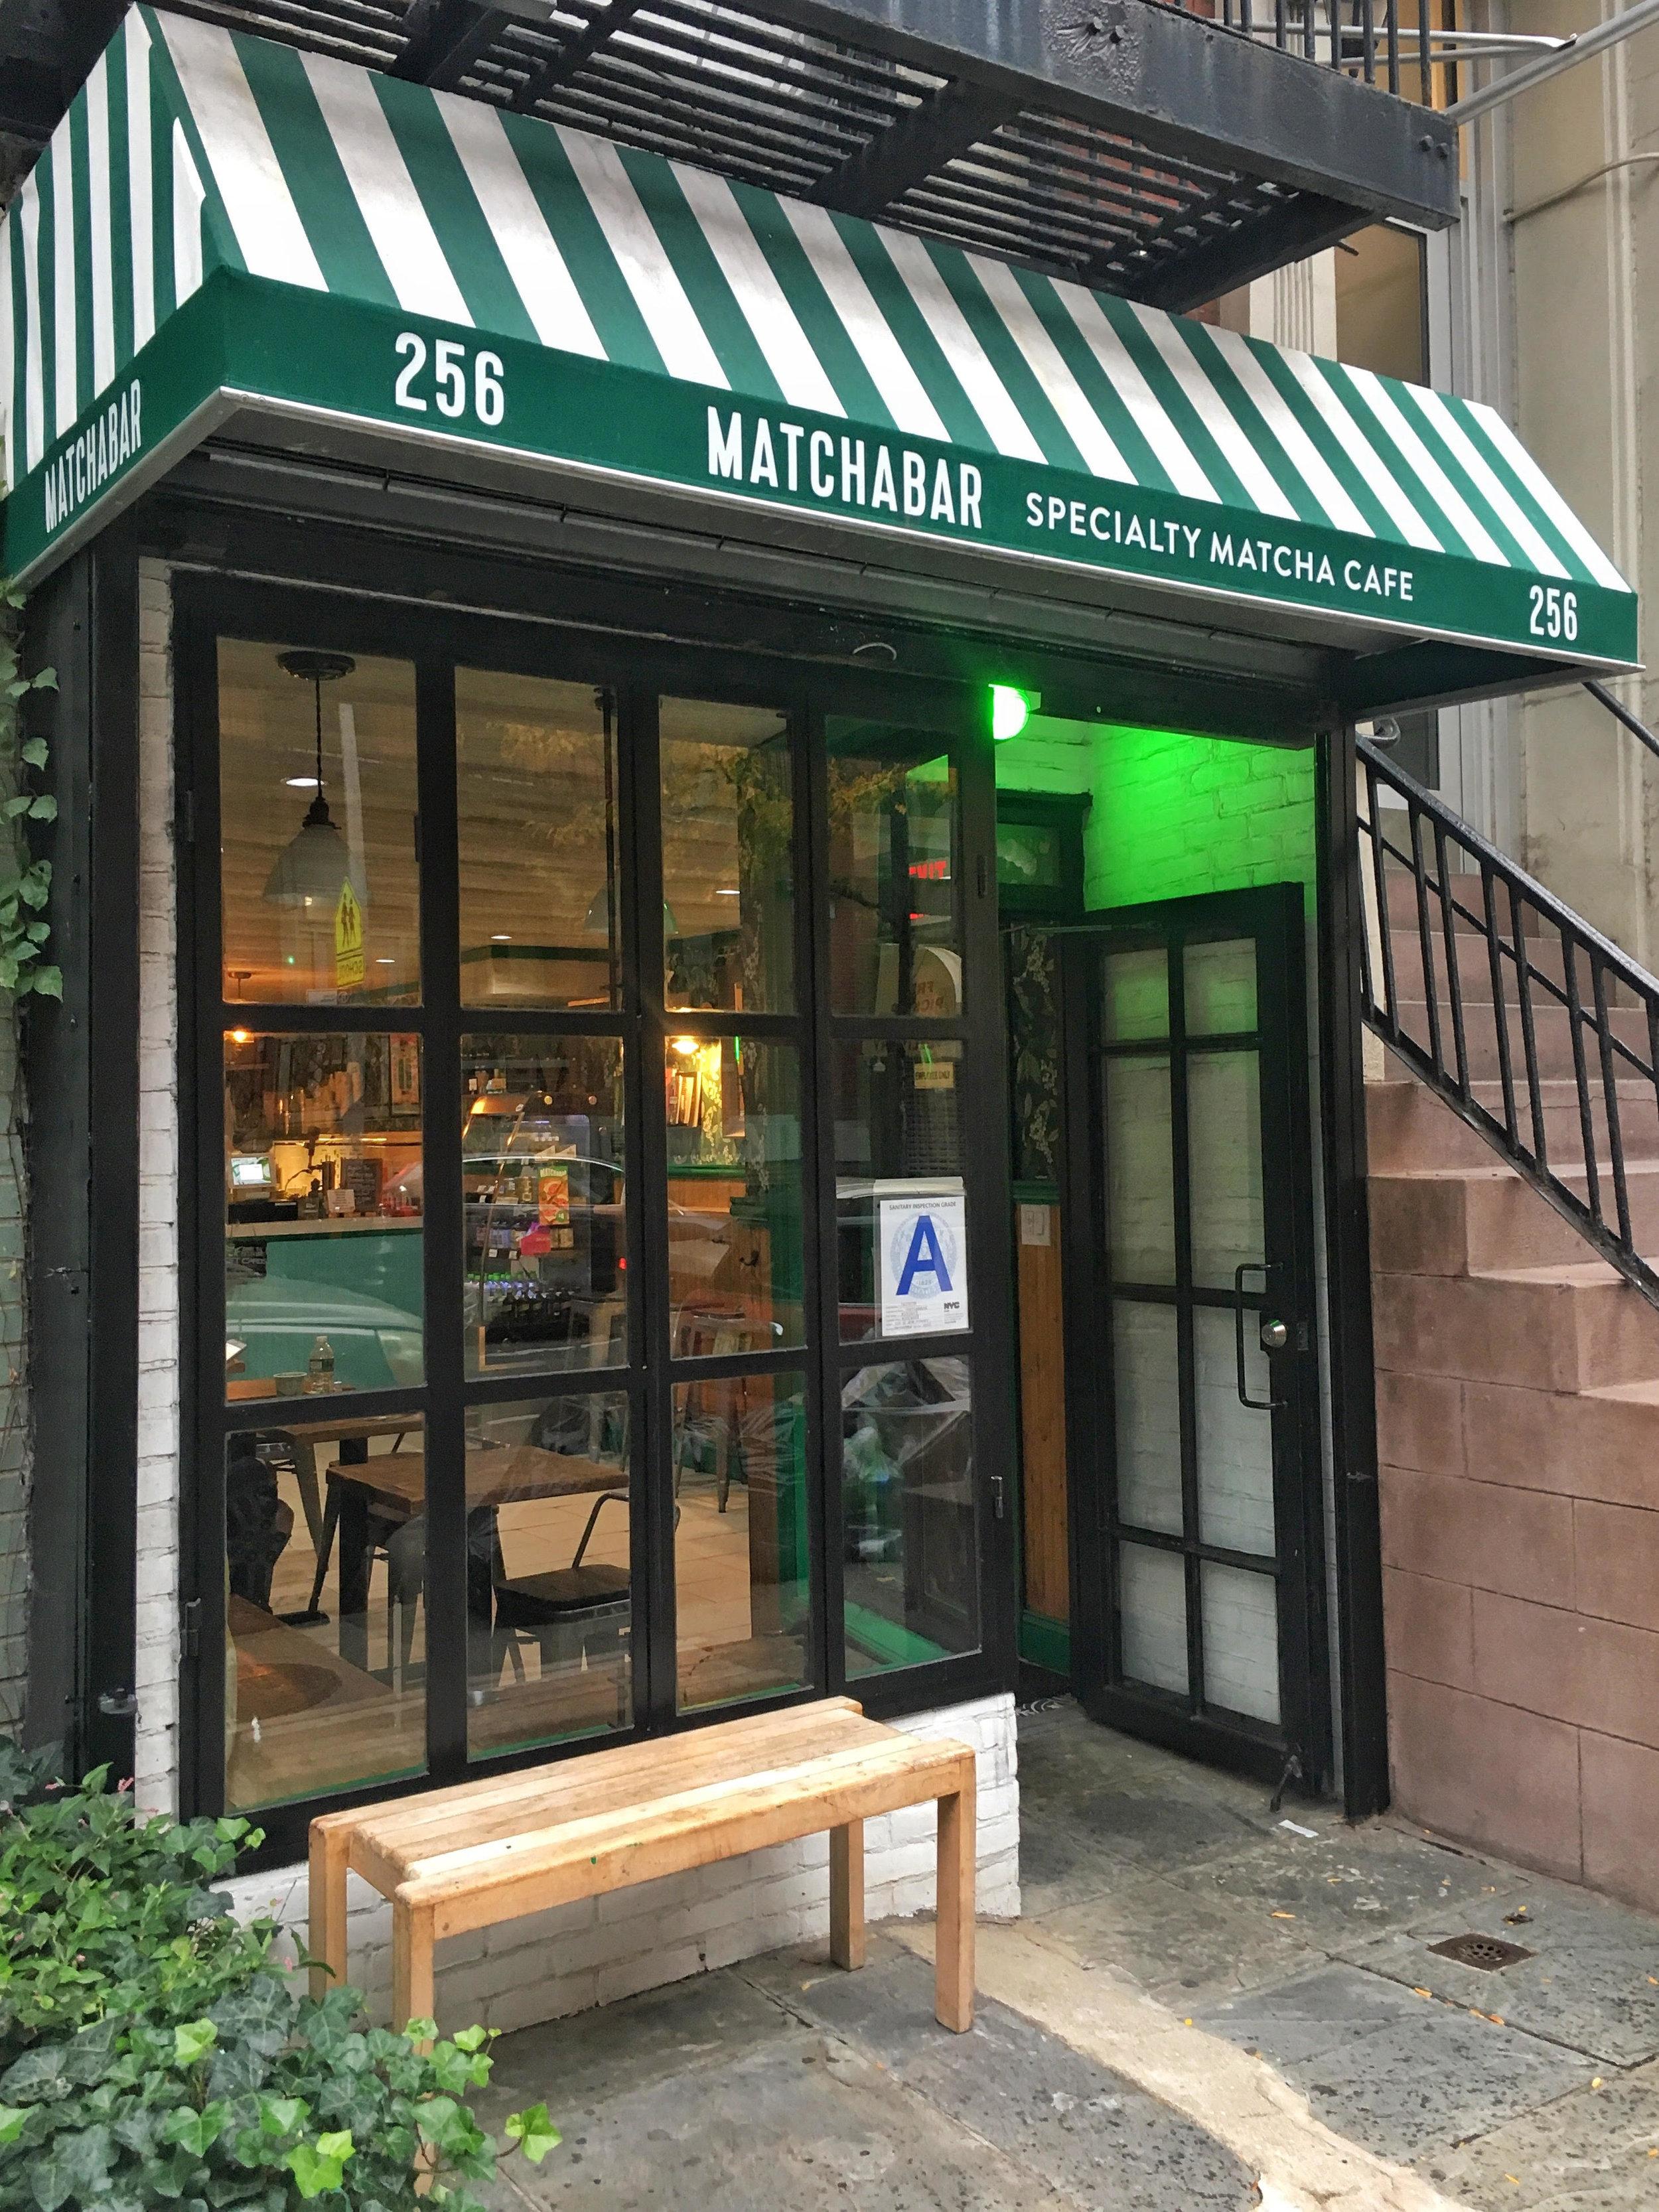 MatchaBar in Chelsea, Manhattan